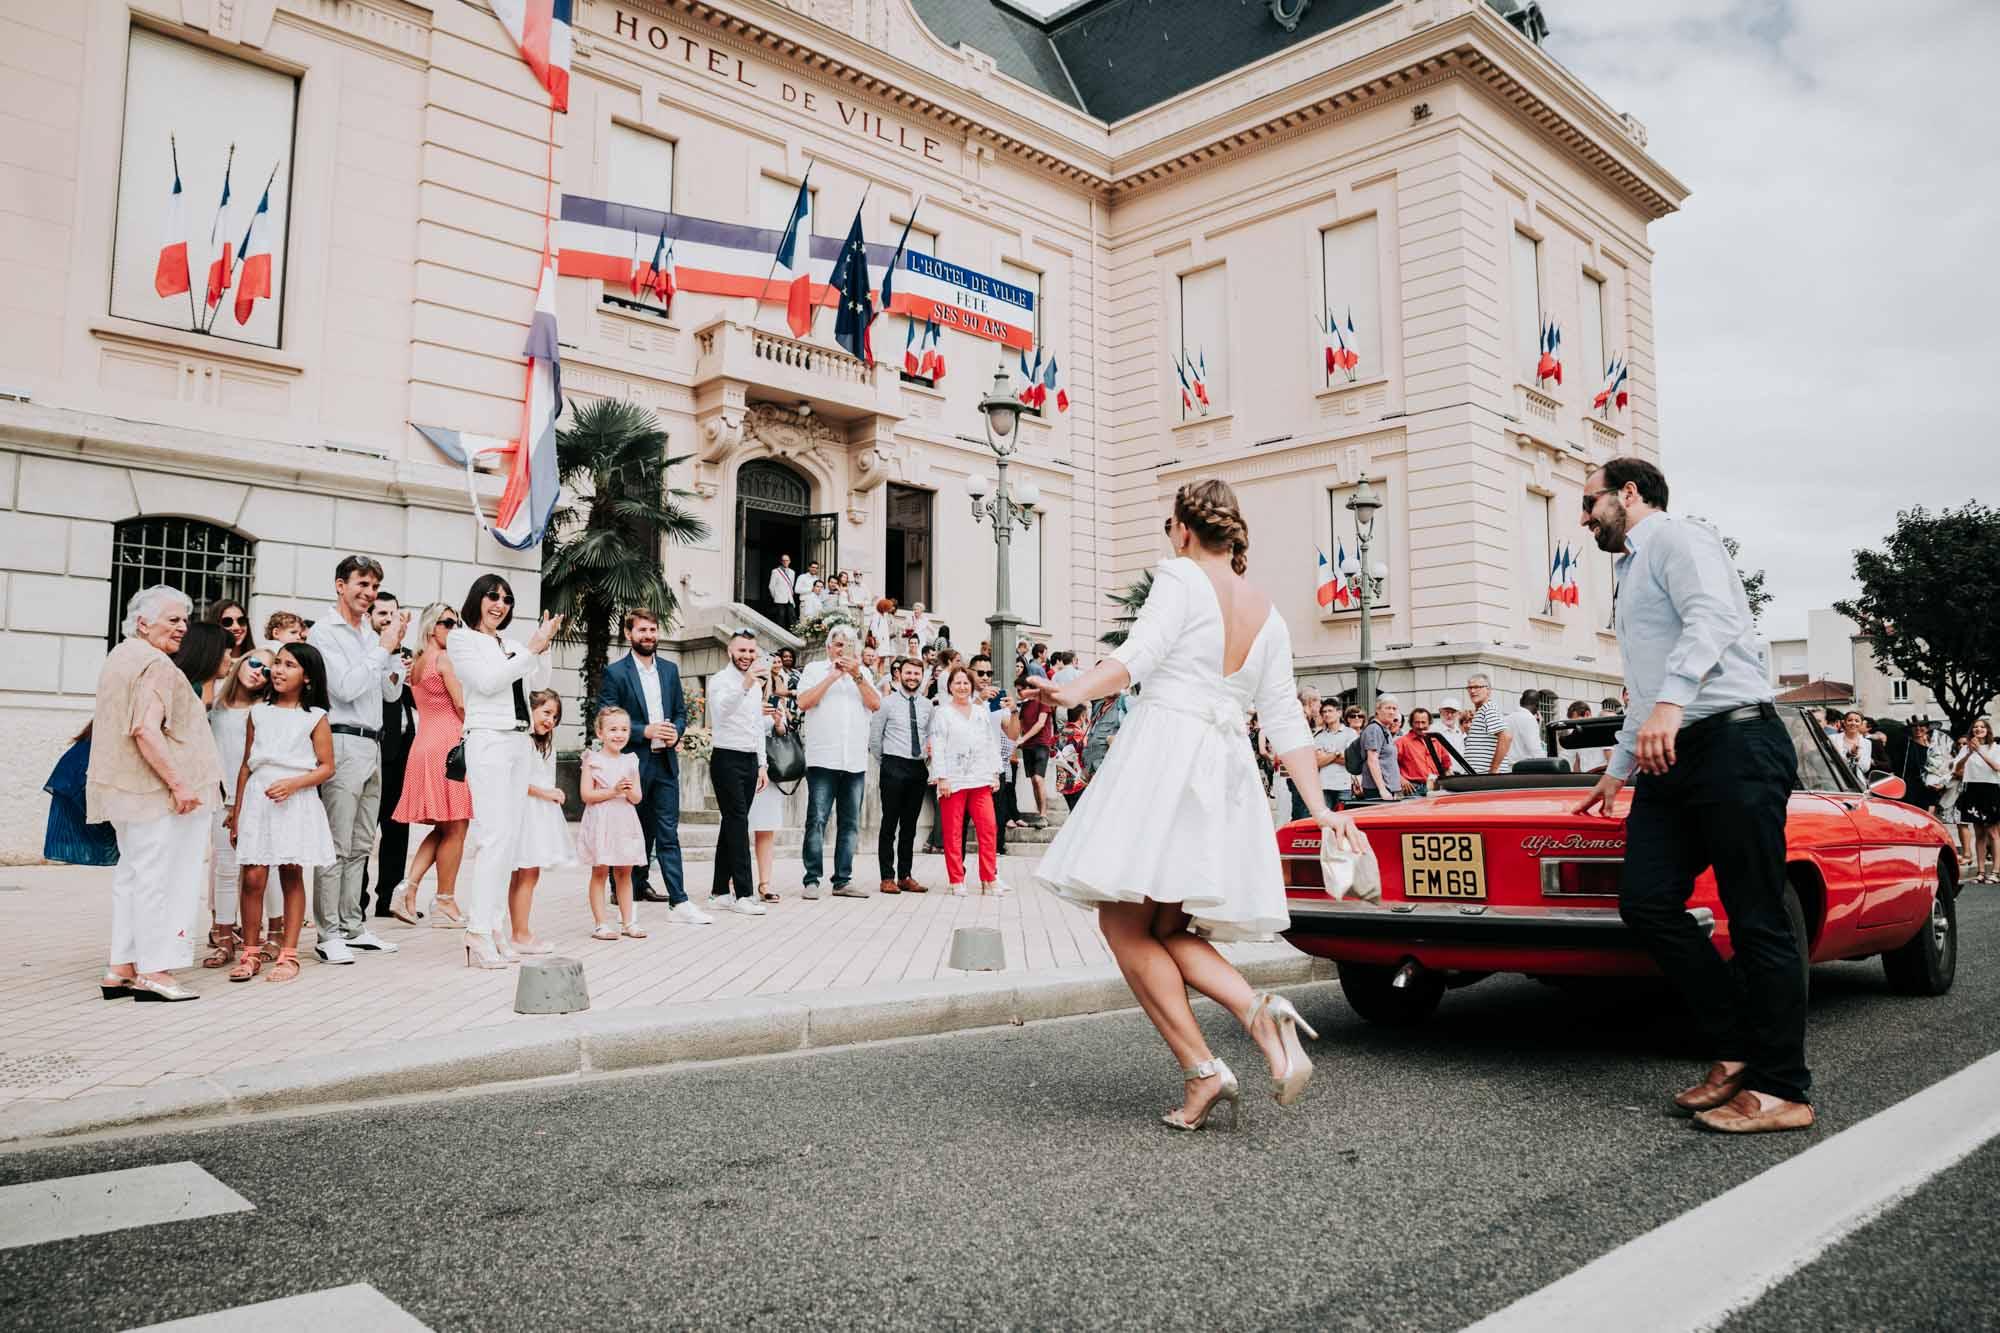 2018-07-21 - LD8_8767 - photographe mariage lyon - laurie diaz - www.lauriediazweeding.com.jpg